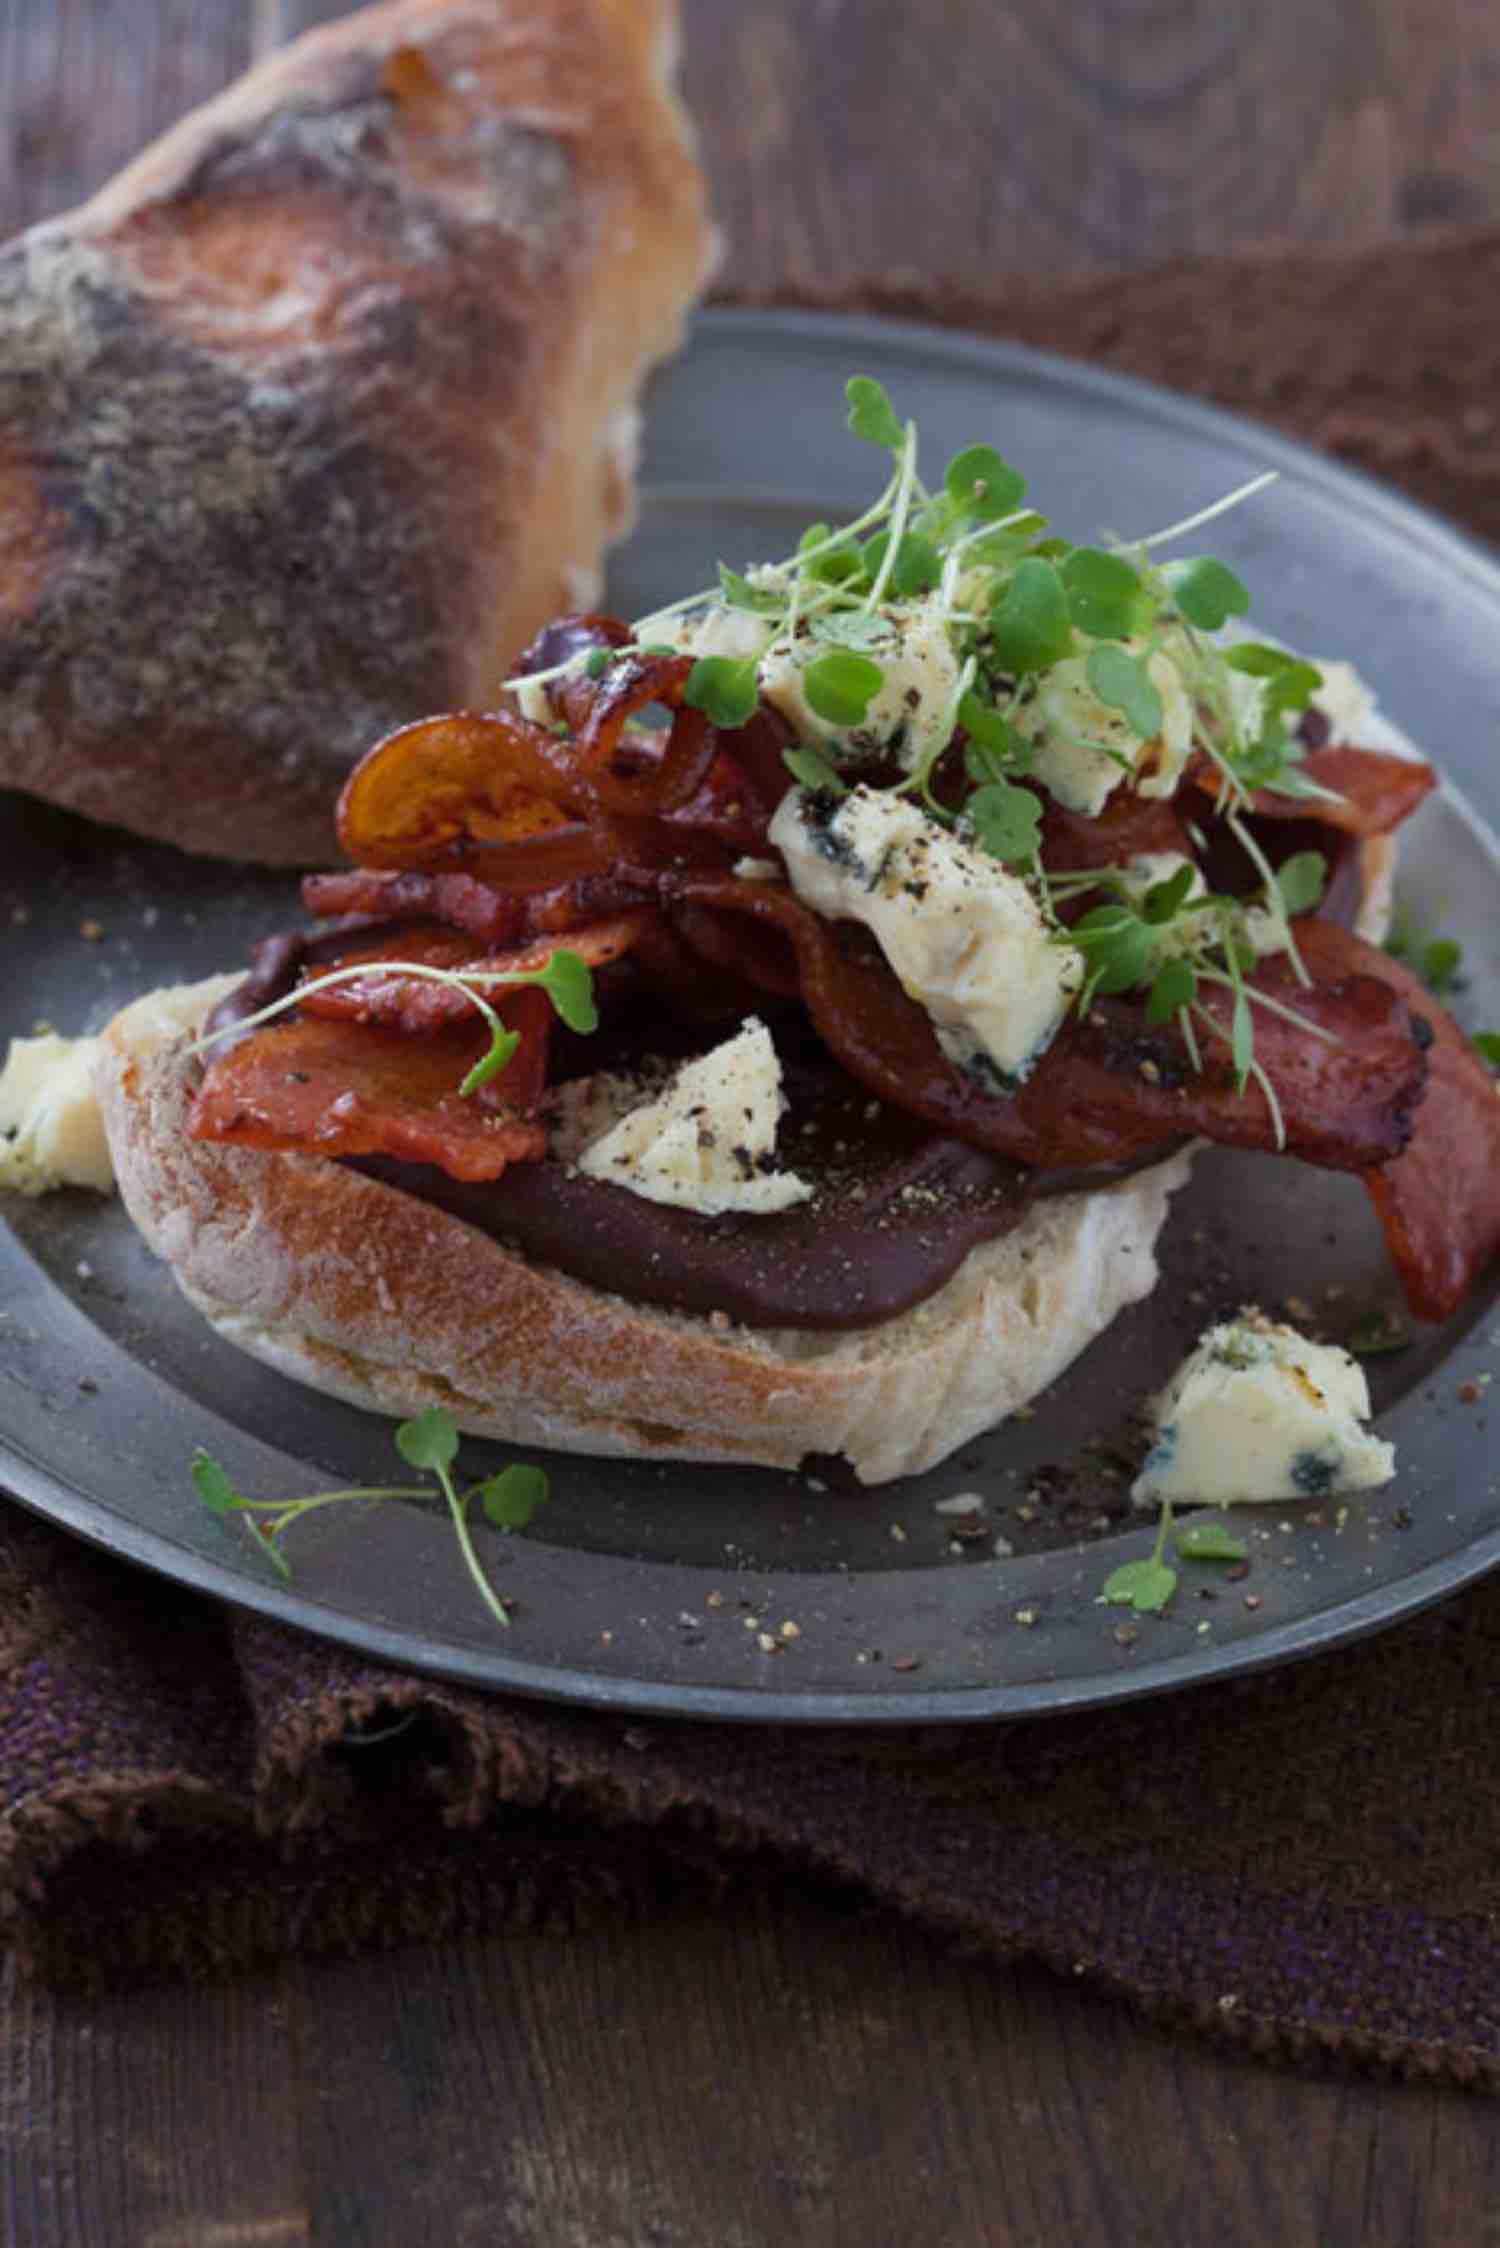 Bacon-chocolate-and-blue-cheese main.jpg